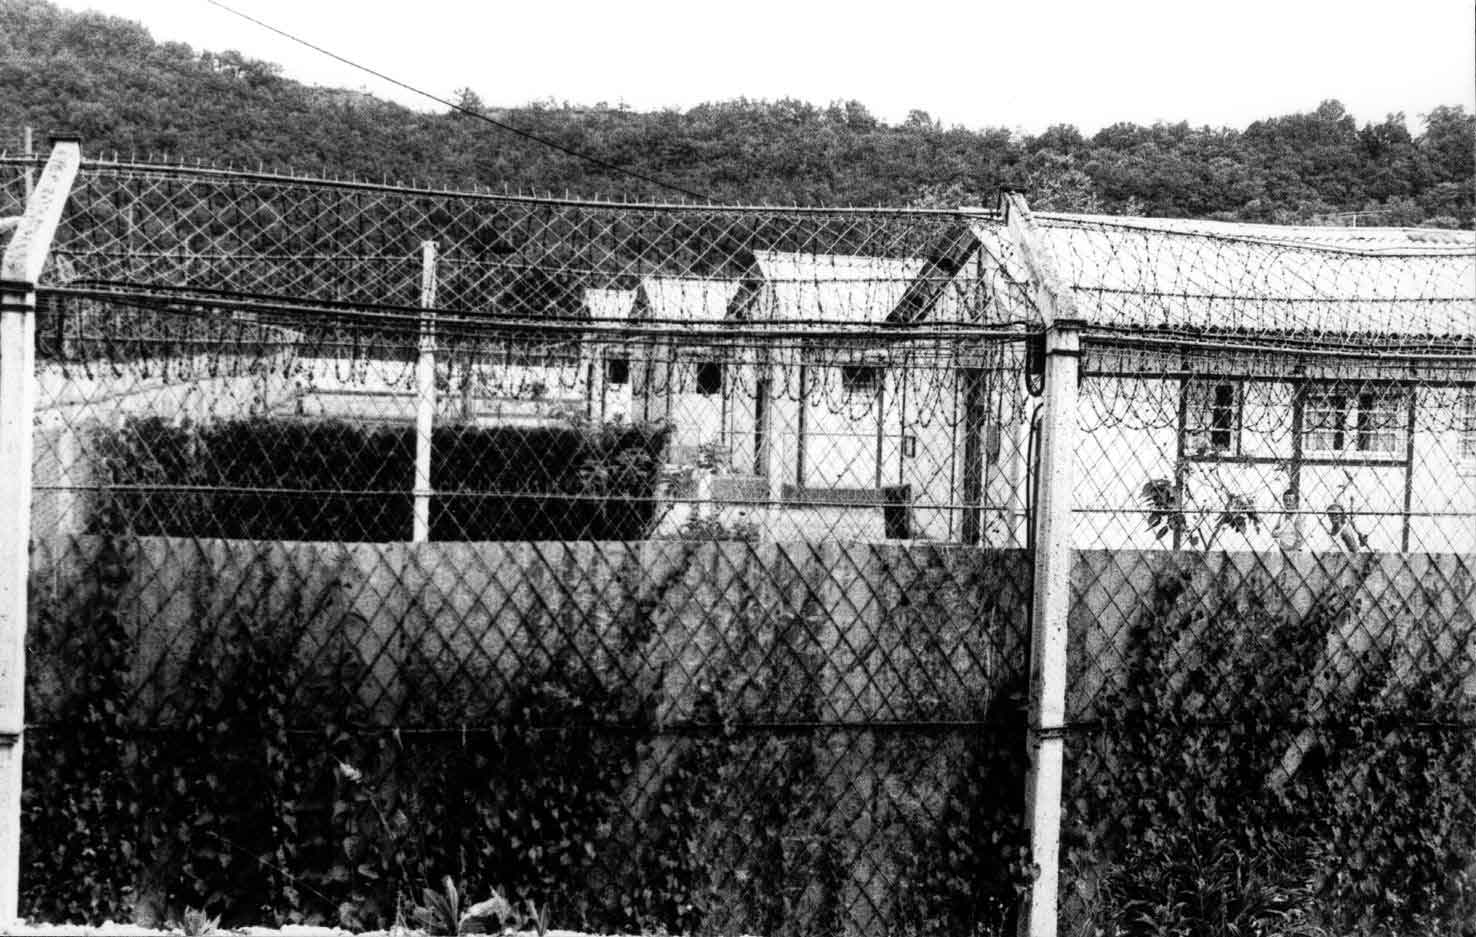 Prison-militaire-de-Mauzac